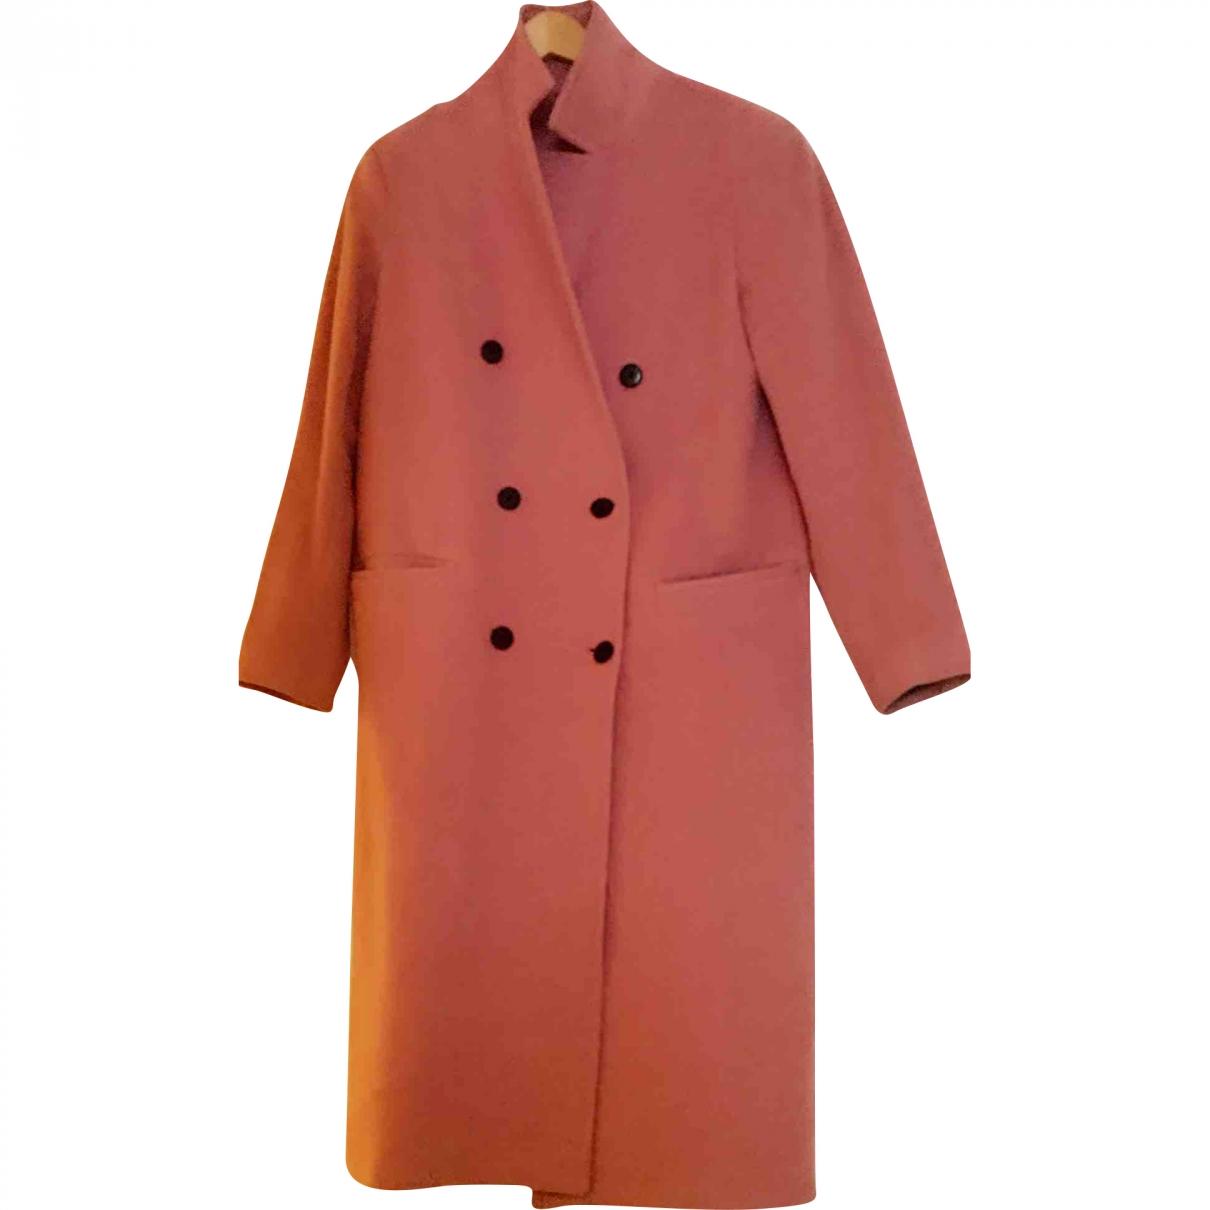 J.lindeberg \N Pink Wool coat for Women 8 UK